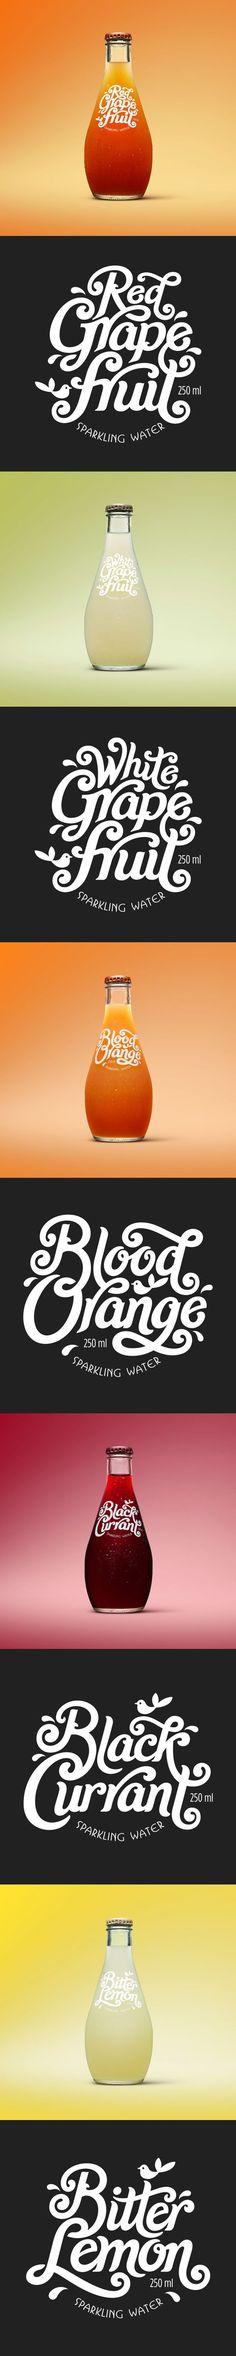 All Good Organics – Label Design (Bottle Design Typography)